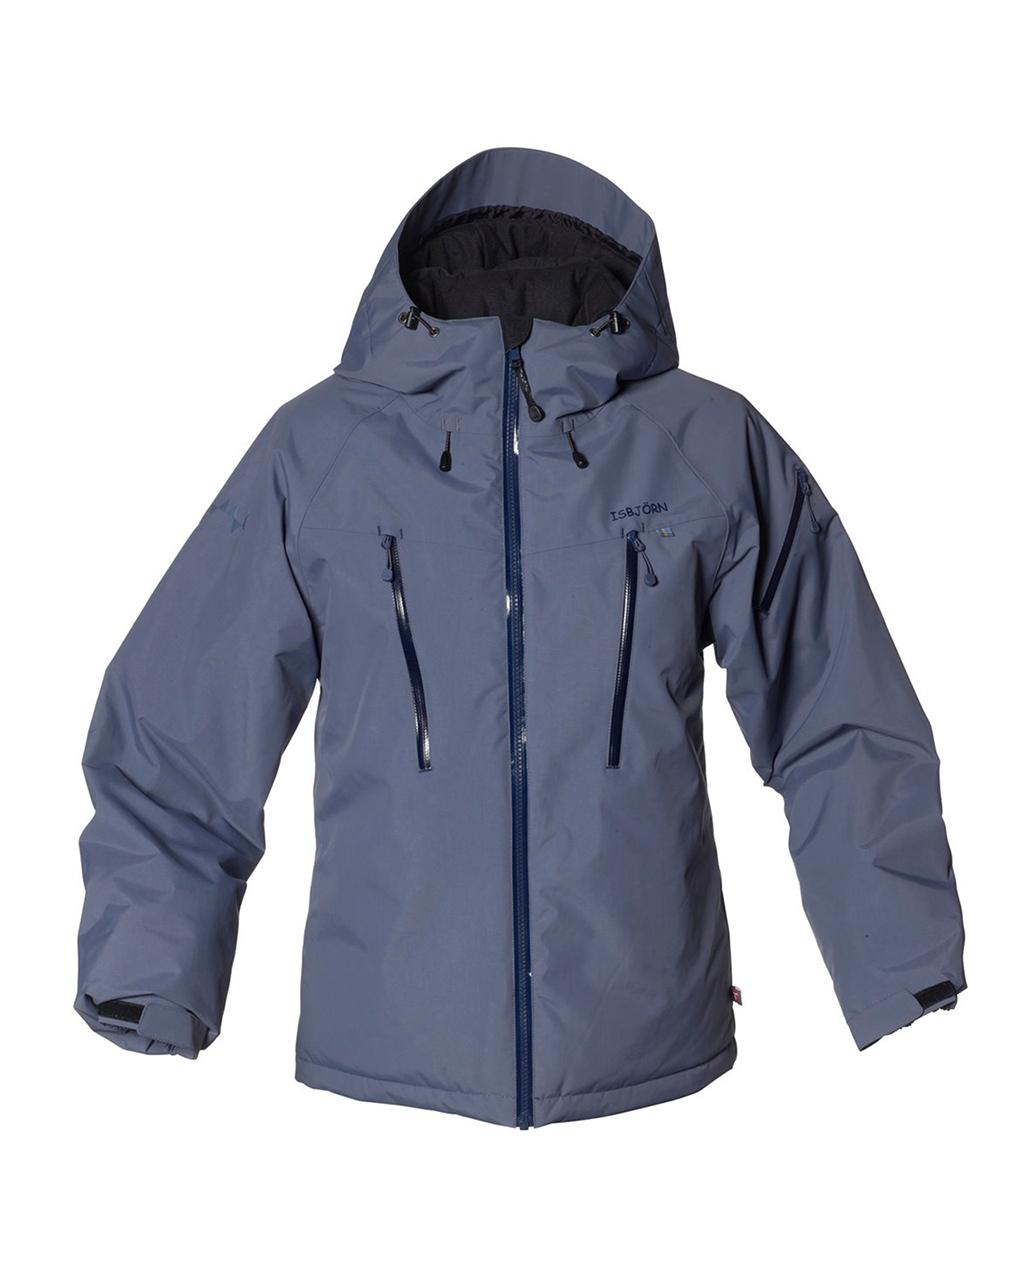 CARVING Winter Jacket barnjacka